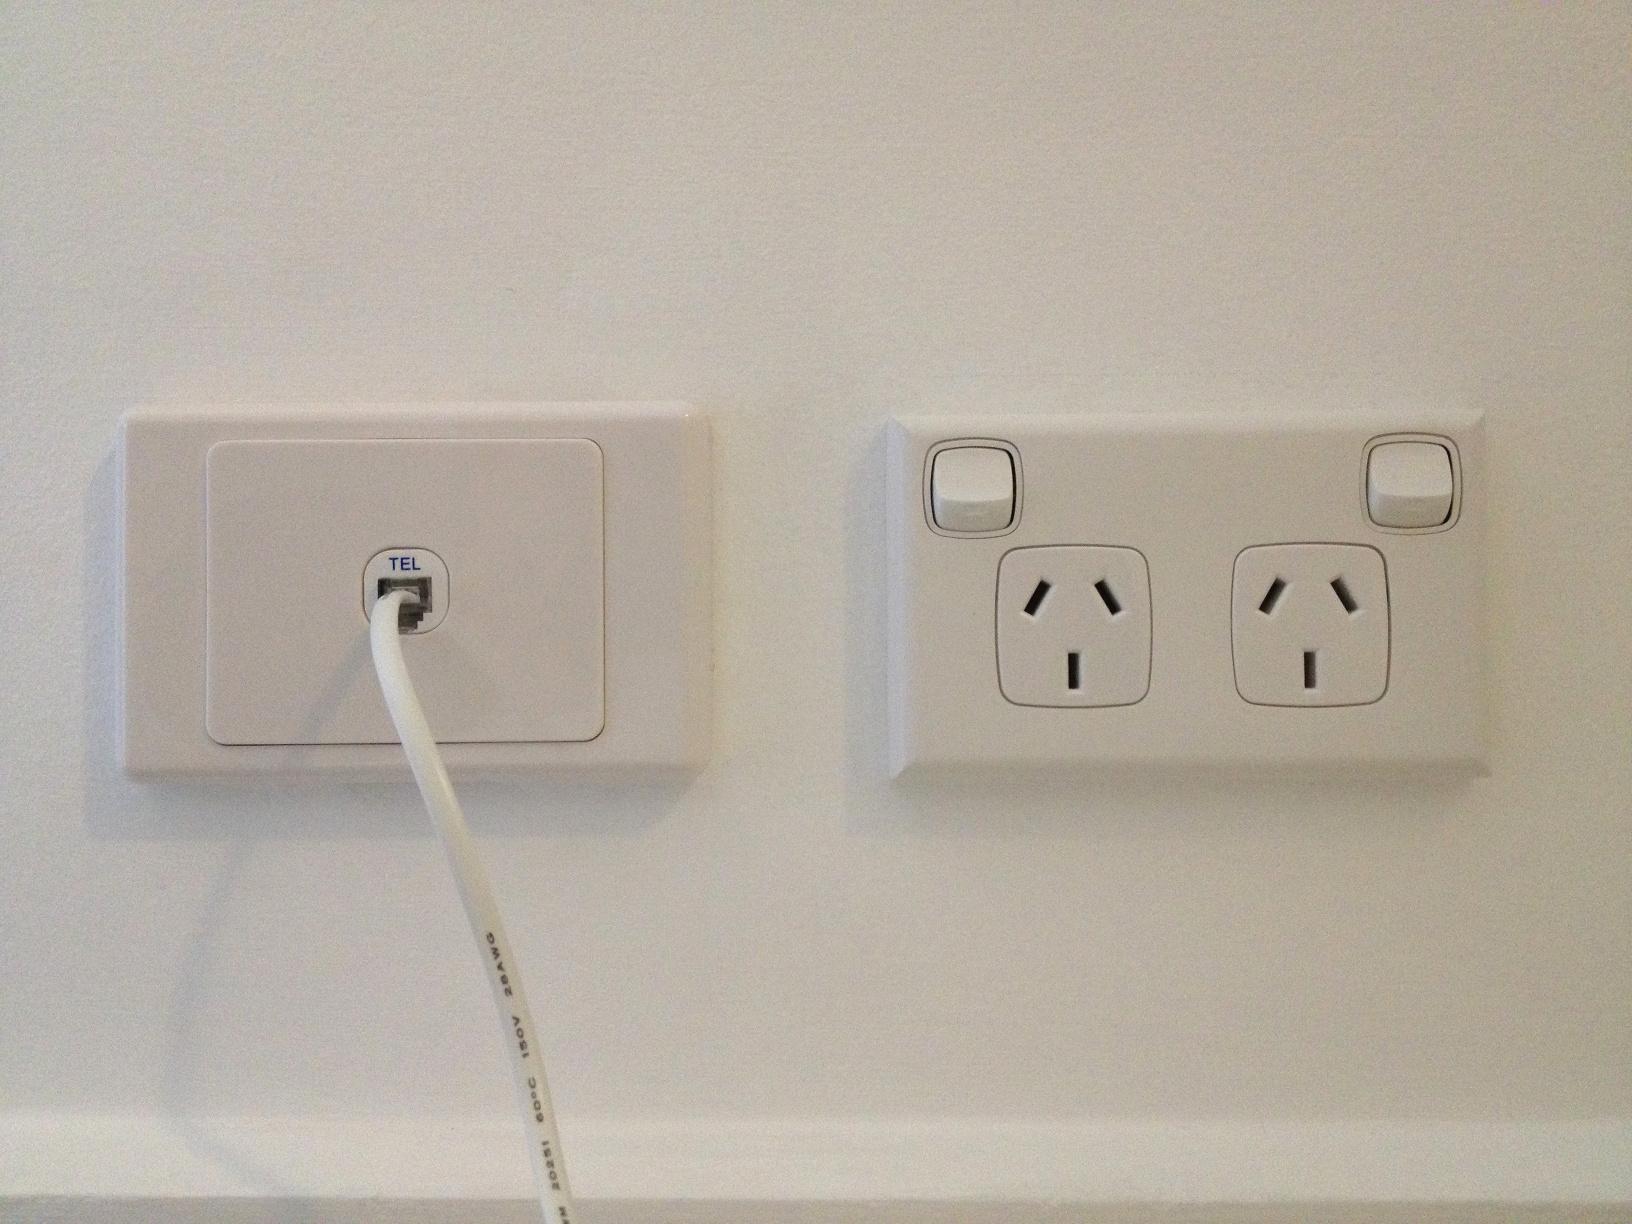 medium resolution of wiring telephone plug australia wiring diagram today rj11 wall socket wiring diagram australia